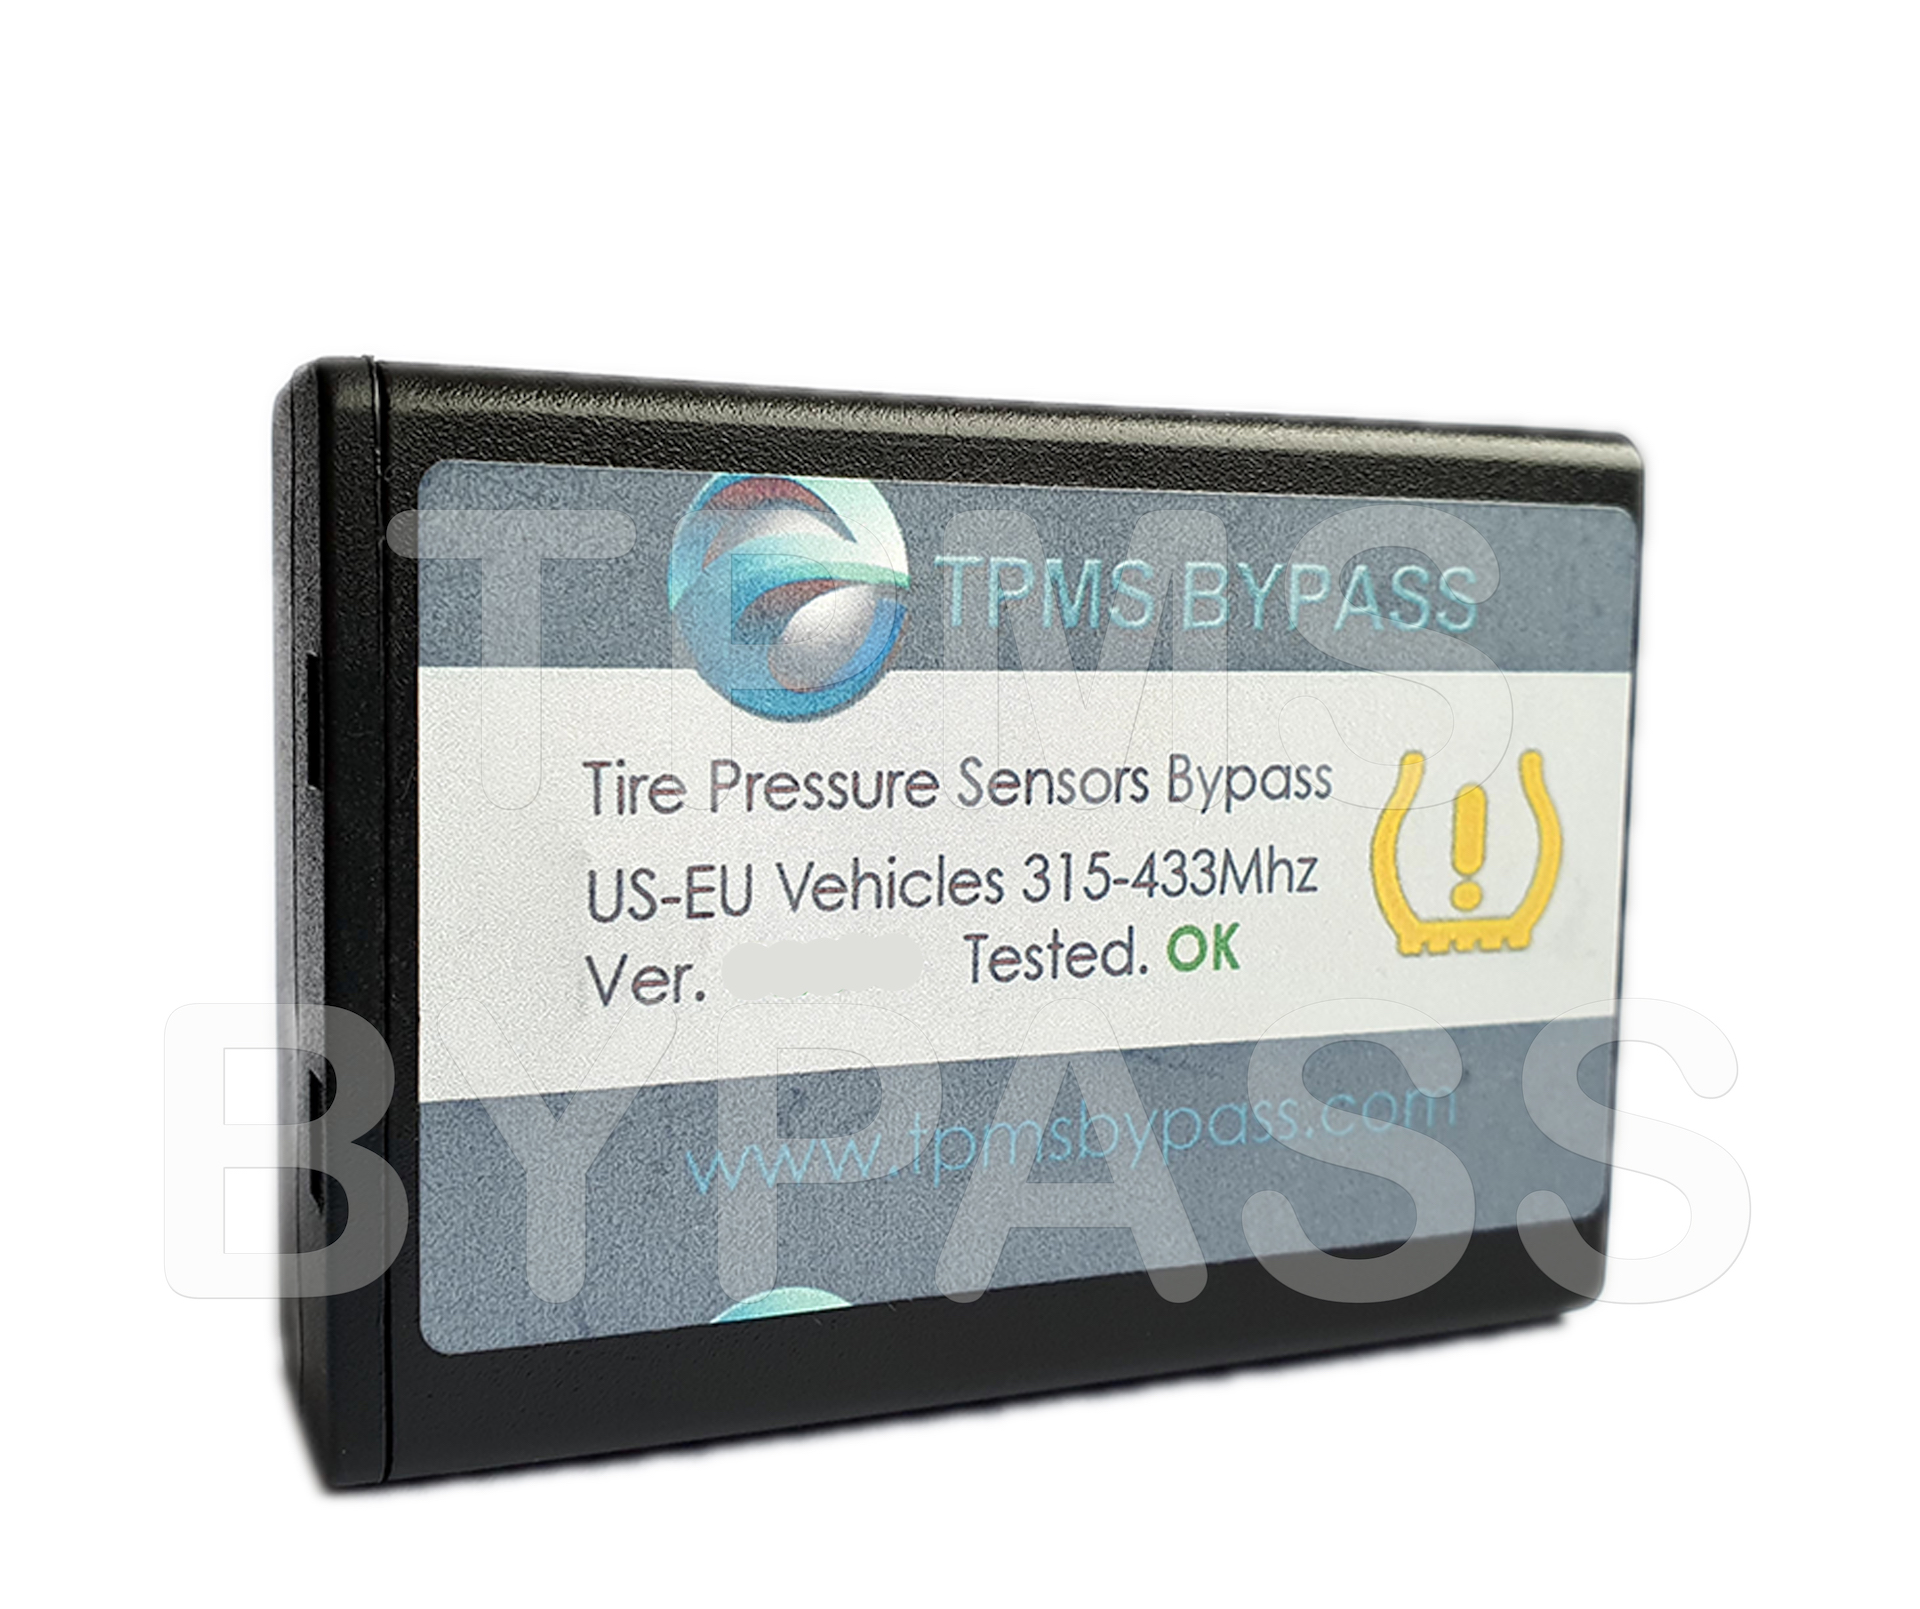 Ford Eu Tpms Bypass Tyre Pressure Sensors Light Repair Disable Reset Emulator